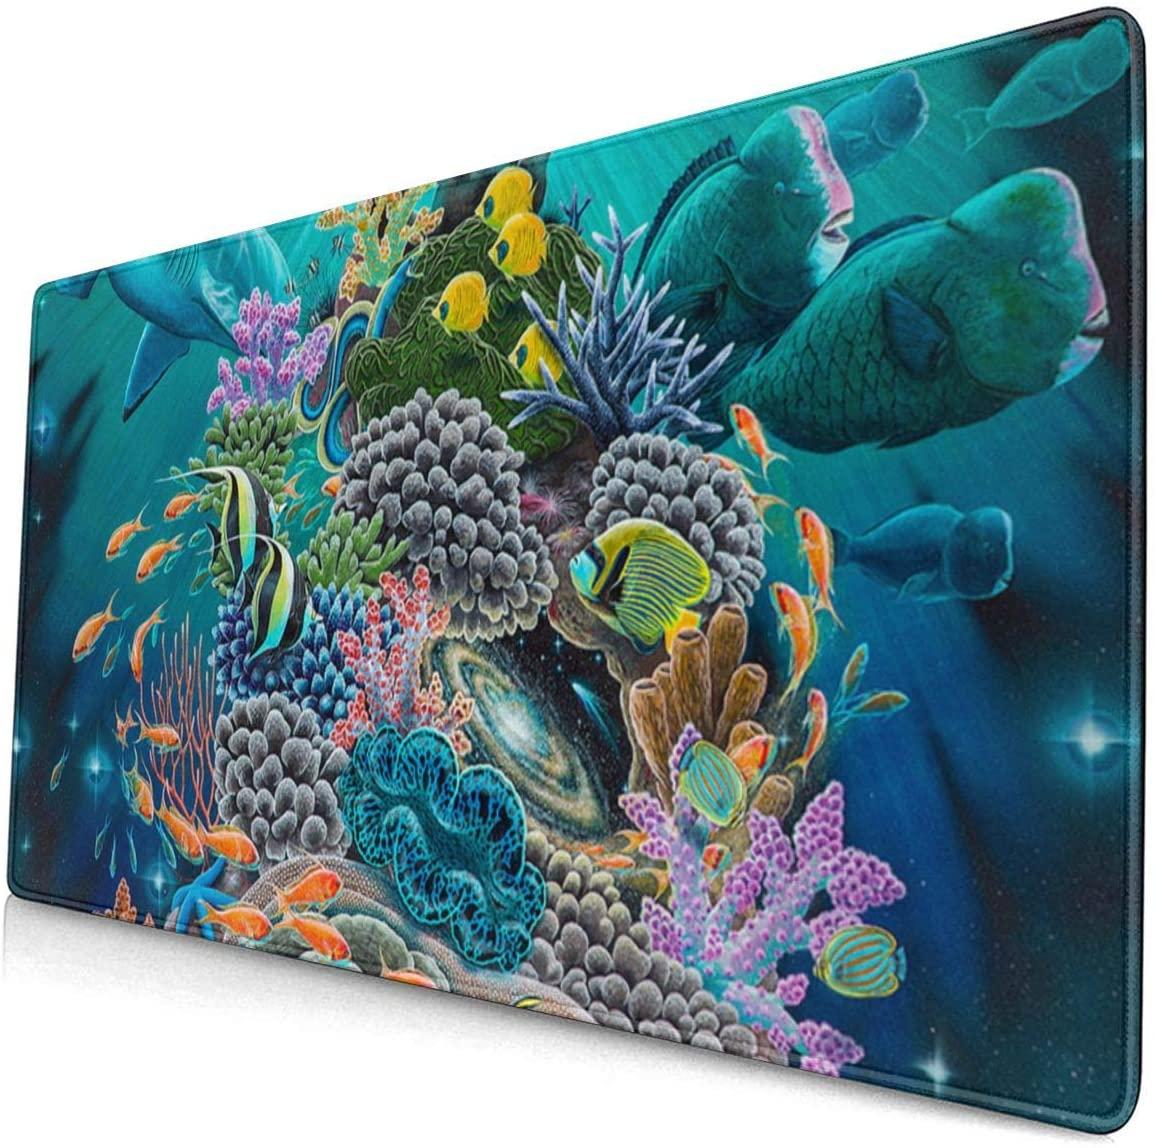 Large Size Mouse pad Anti-Slip Desk Mouse Mat Desk Protector Mat (Ocean Good Luck Turtle Hammerhead Sharks)